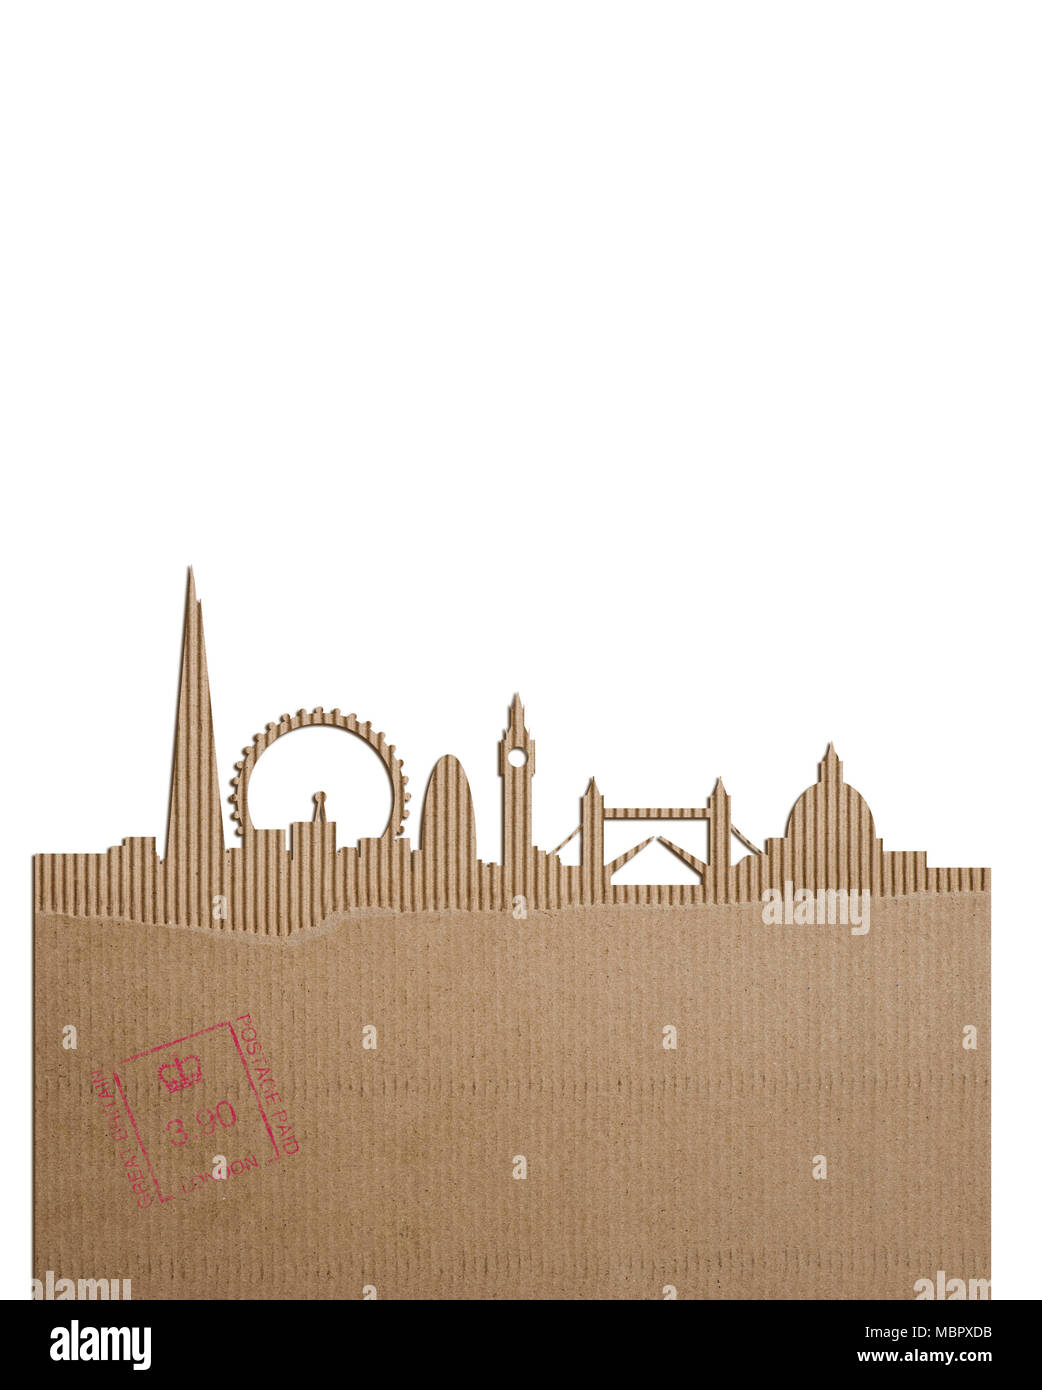 A cardboard cutout of the London skyline - Stock Image